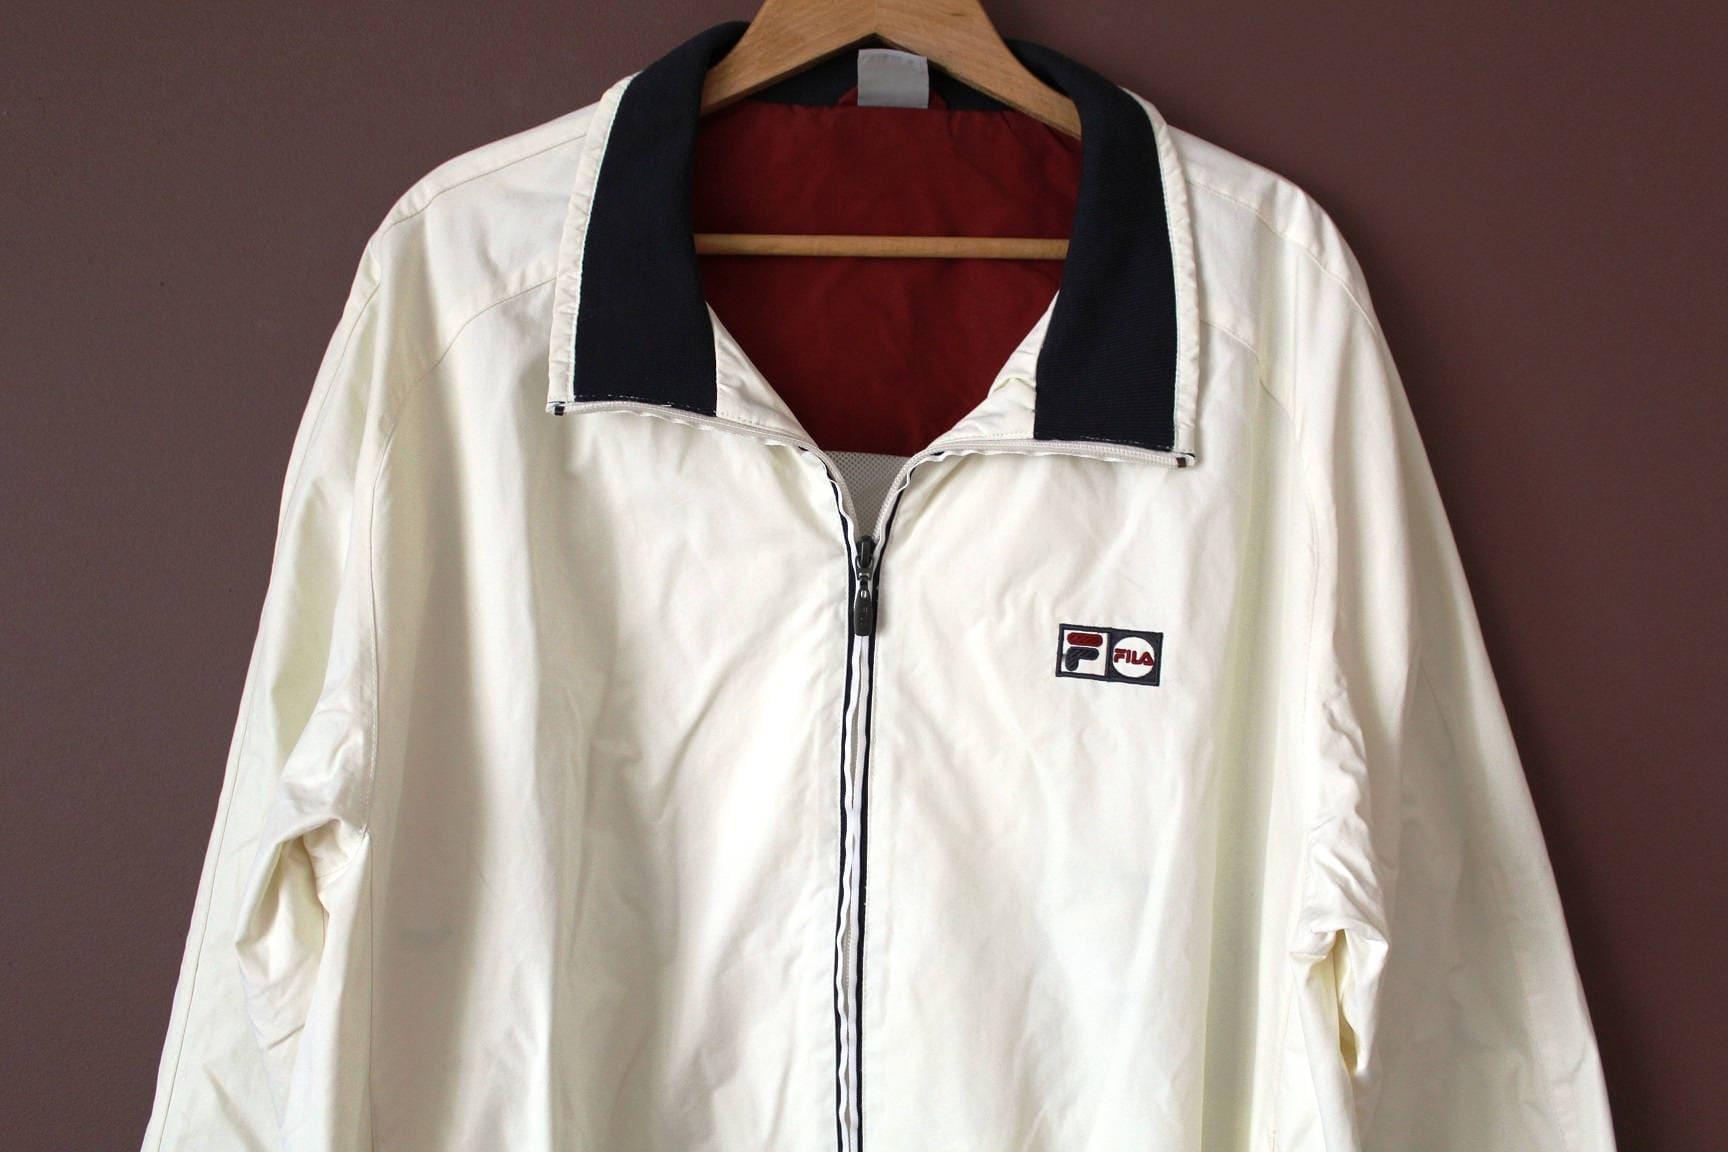 0035ca7725ad8 Vintage FILA Jacket, 90's Fila Windbreaker, Cream Blue Red Fila Windrunner,  Fila Tennis Sportswear, Fila Track Top, Fila Trainer Jacket